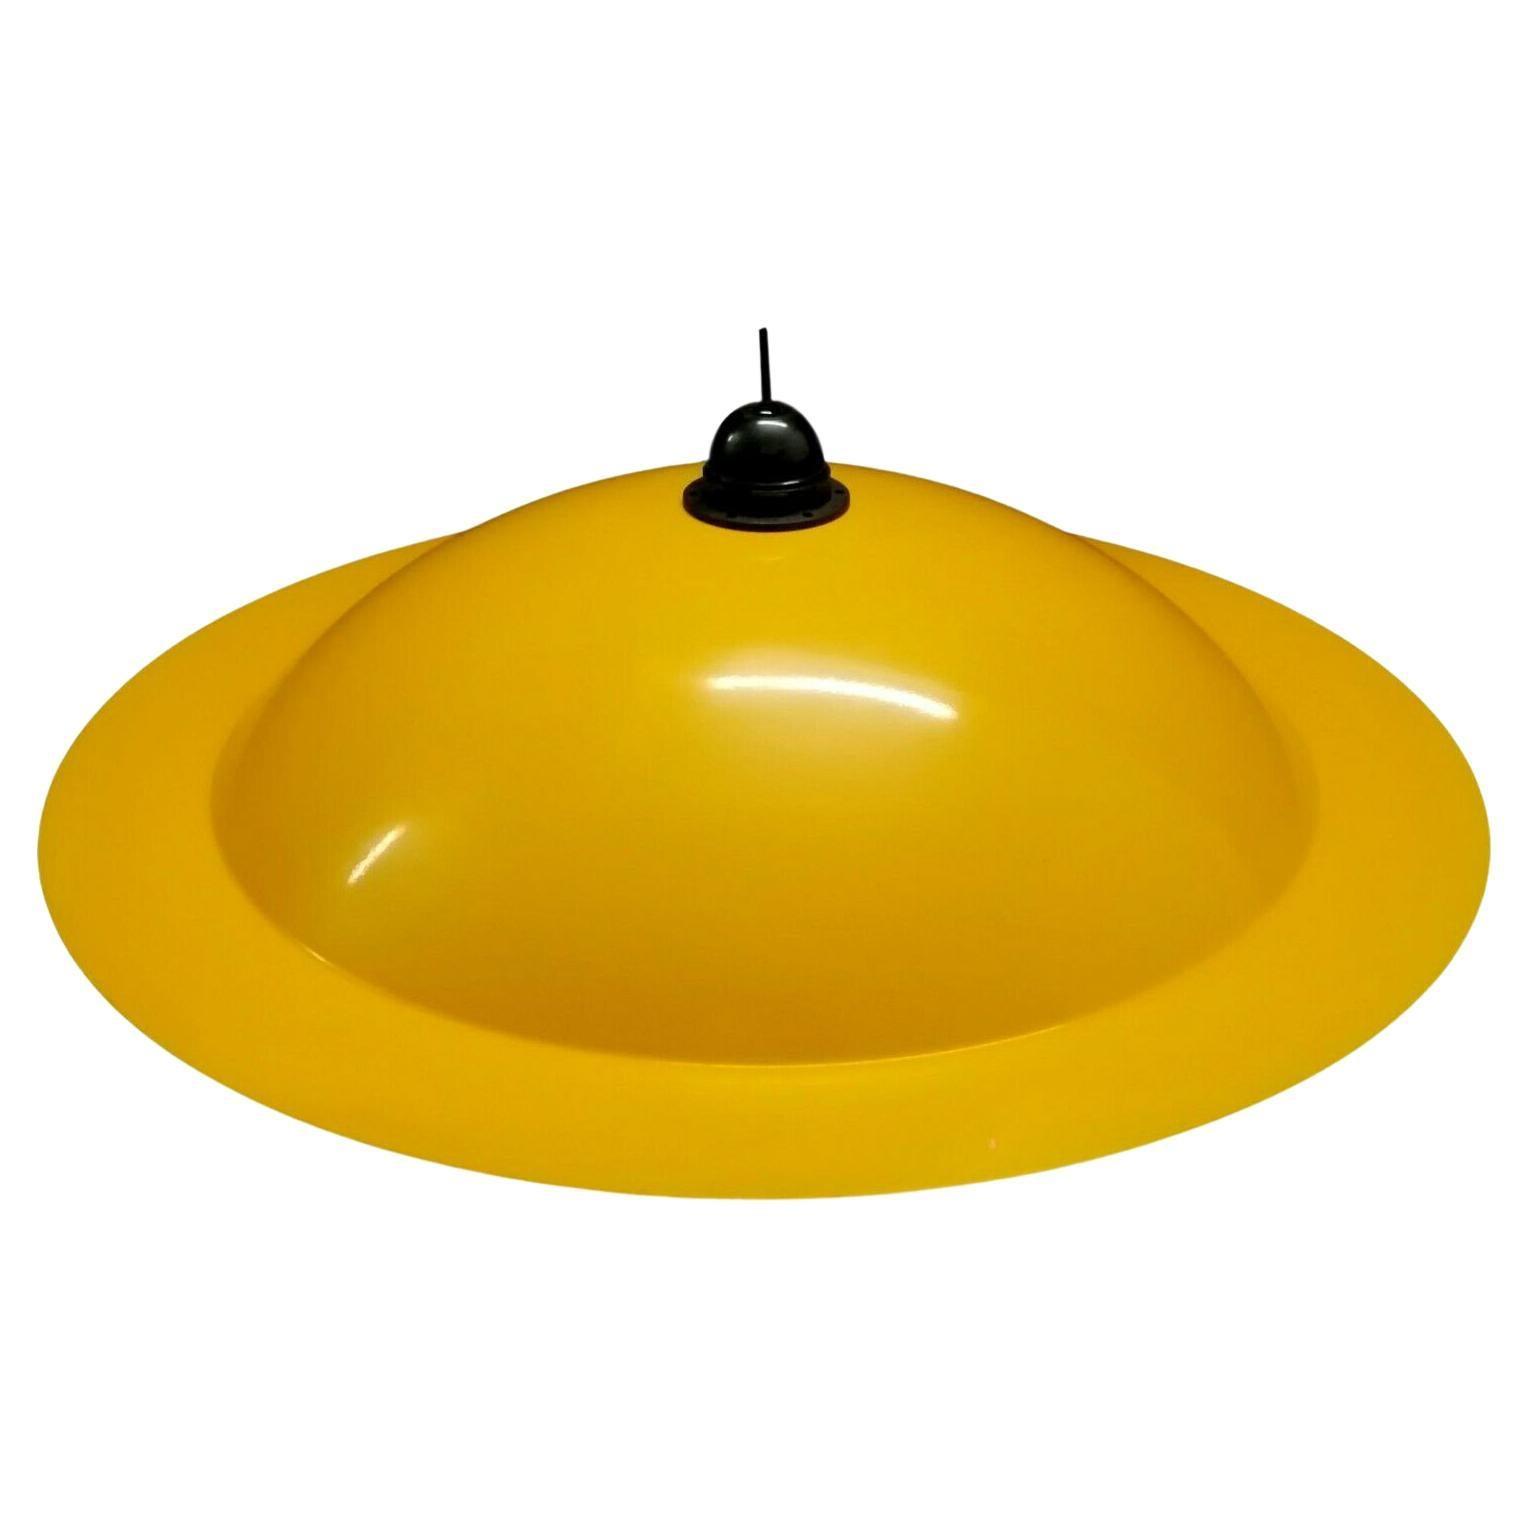 "Suspension Lamp ""Lampiatta"" Design De Pas D'Urbino Lomazzi for Stilnovo, 1971"